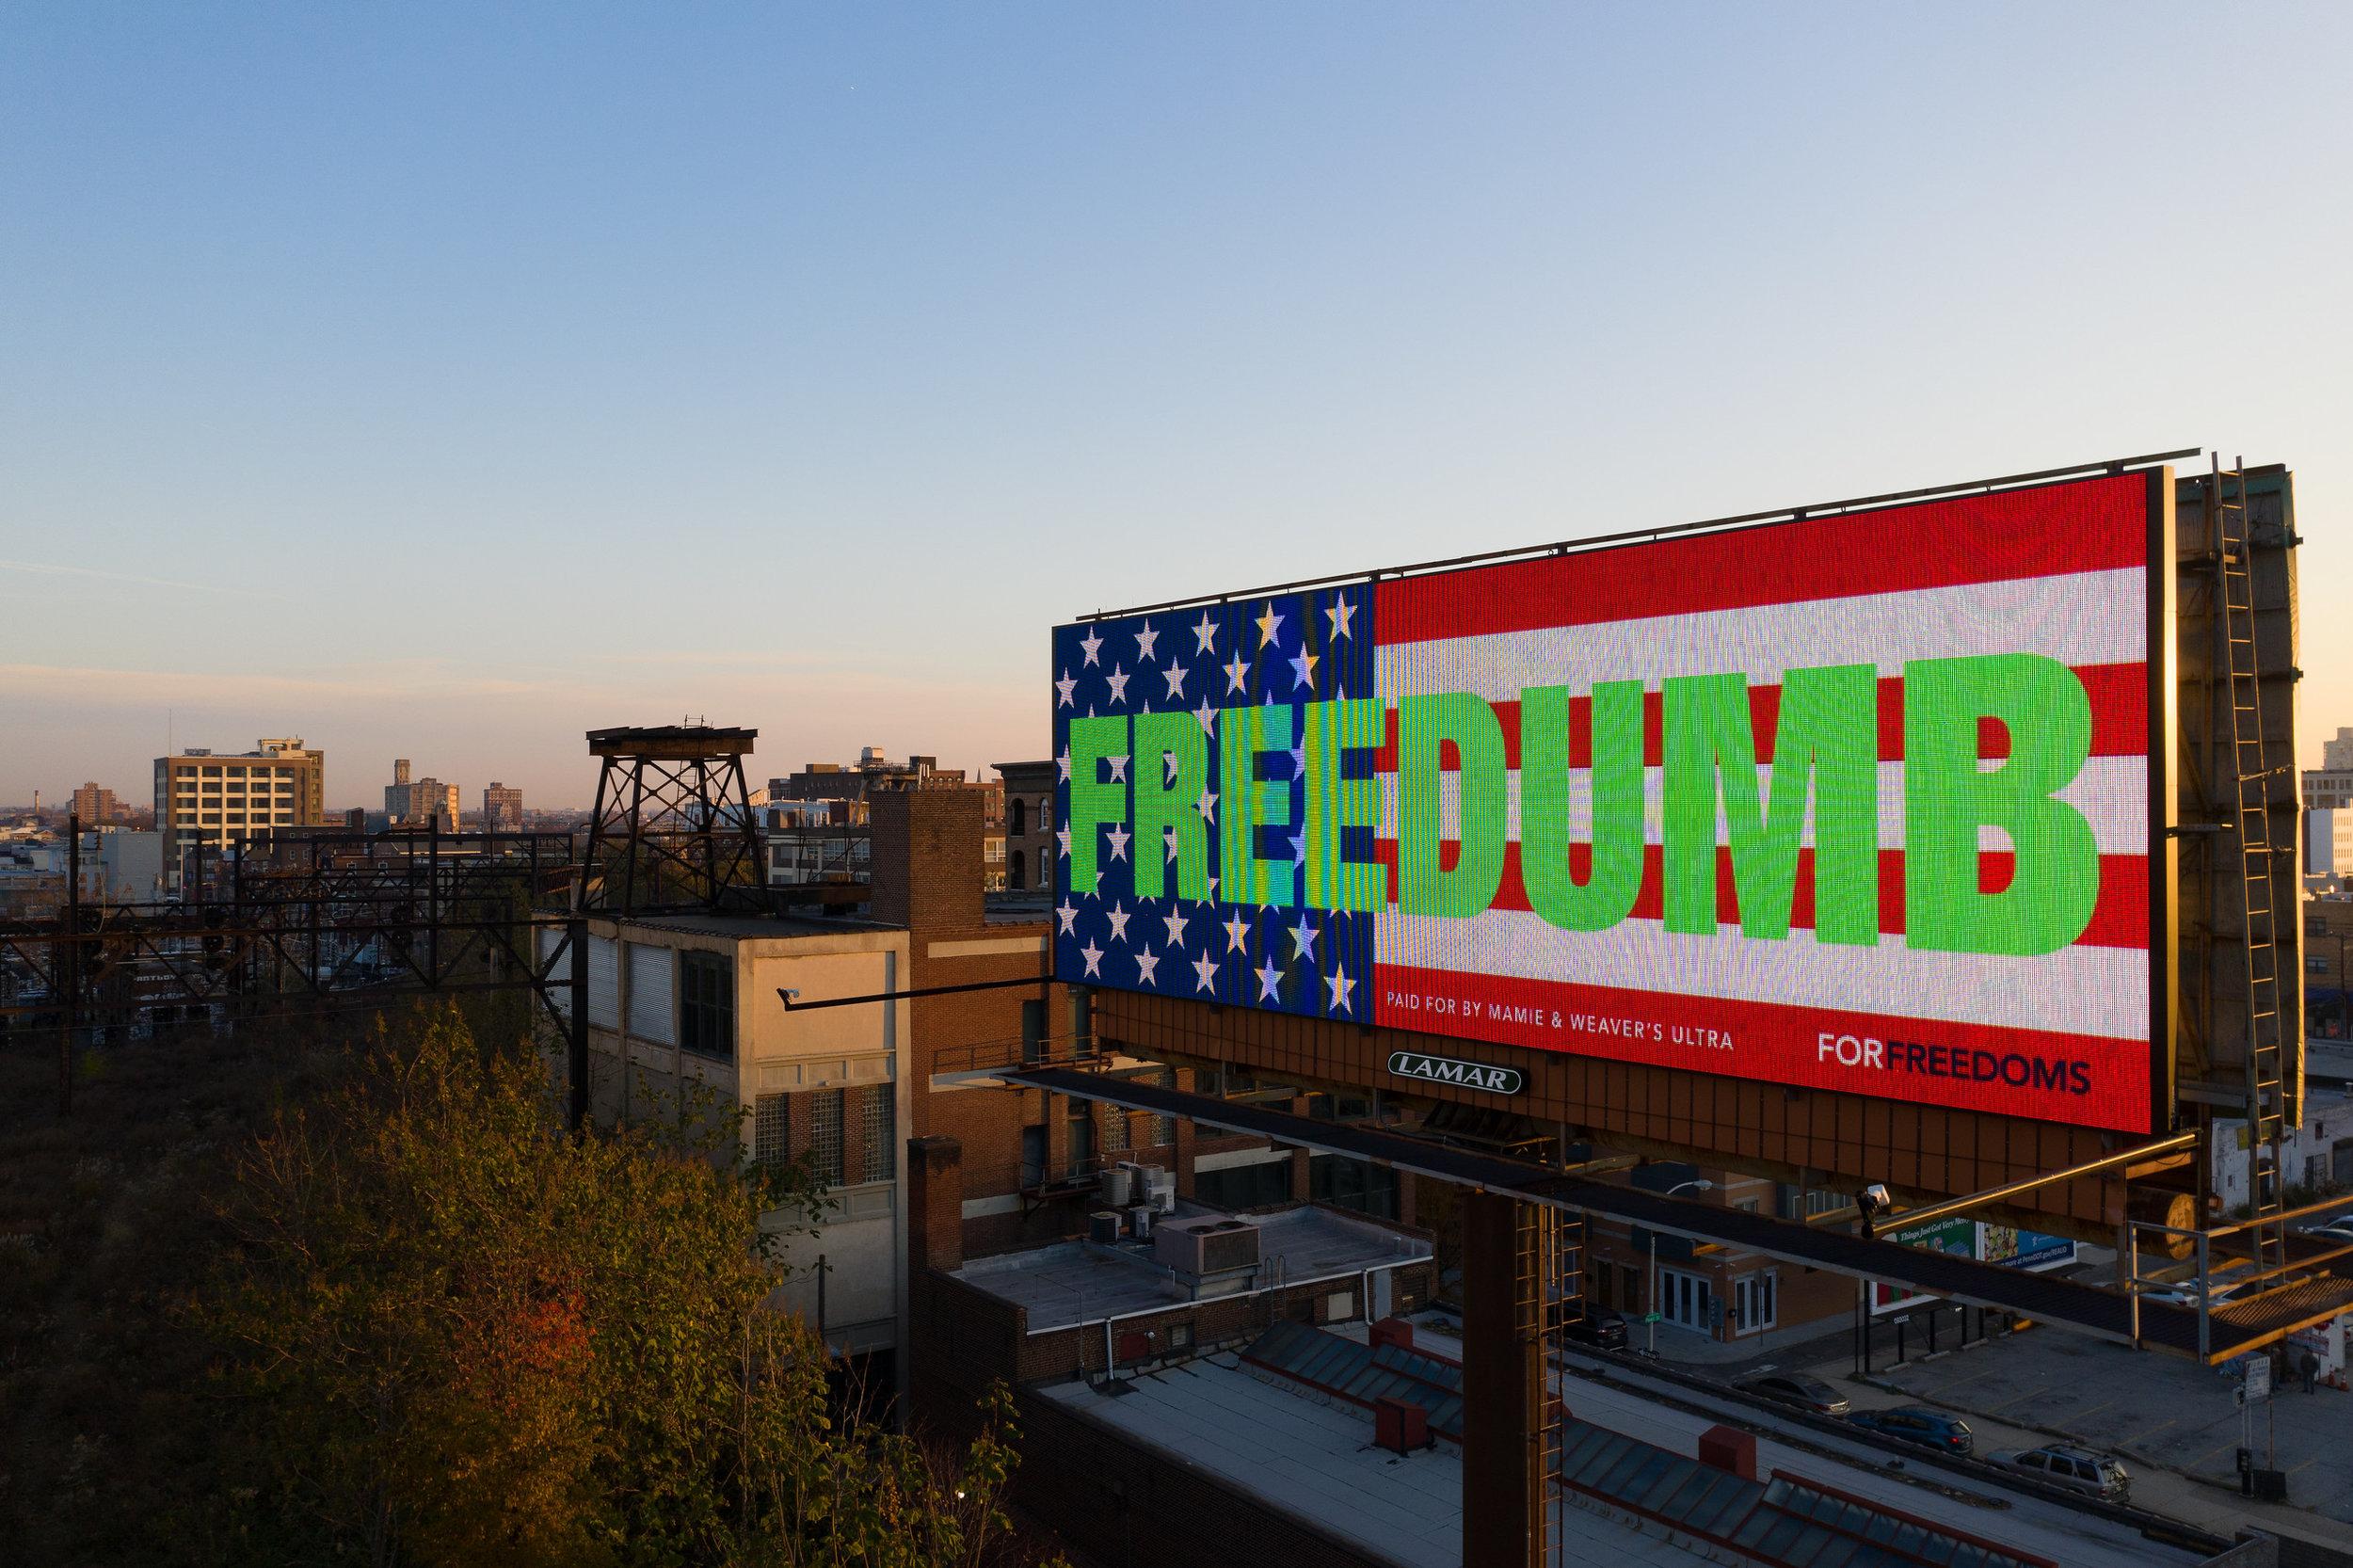 FREEDUMB Fishtown.jpg